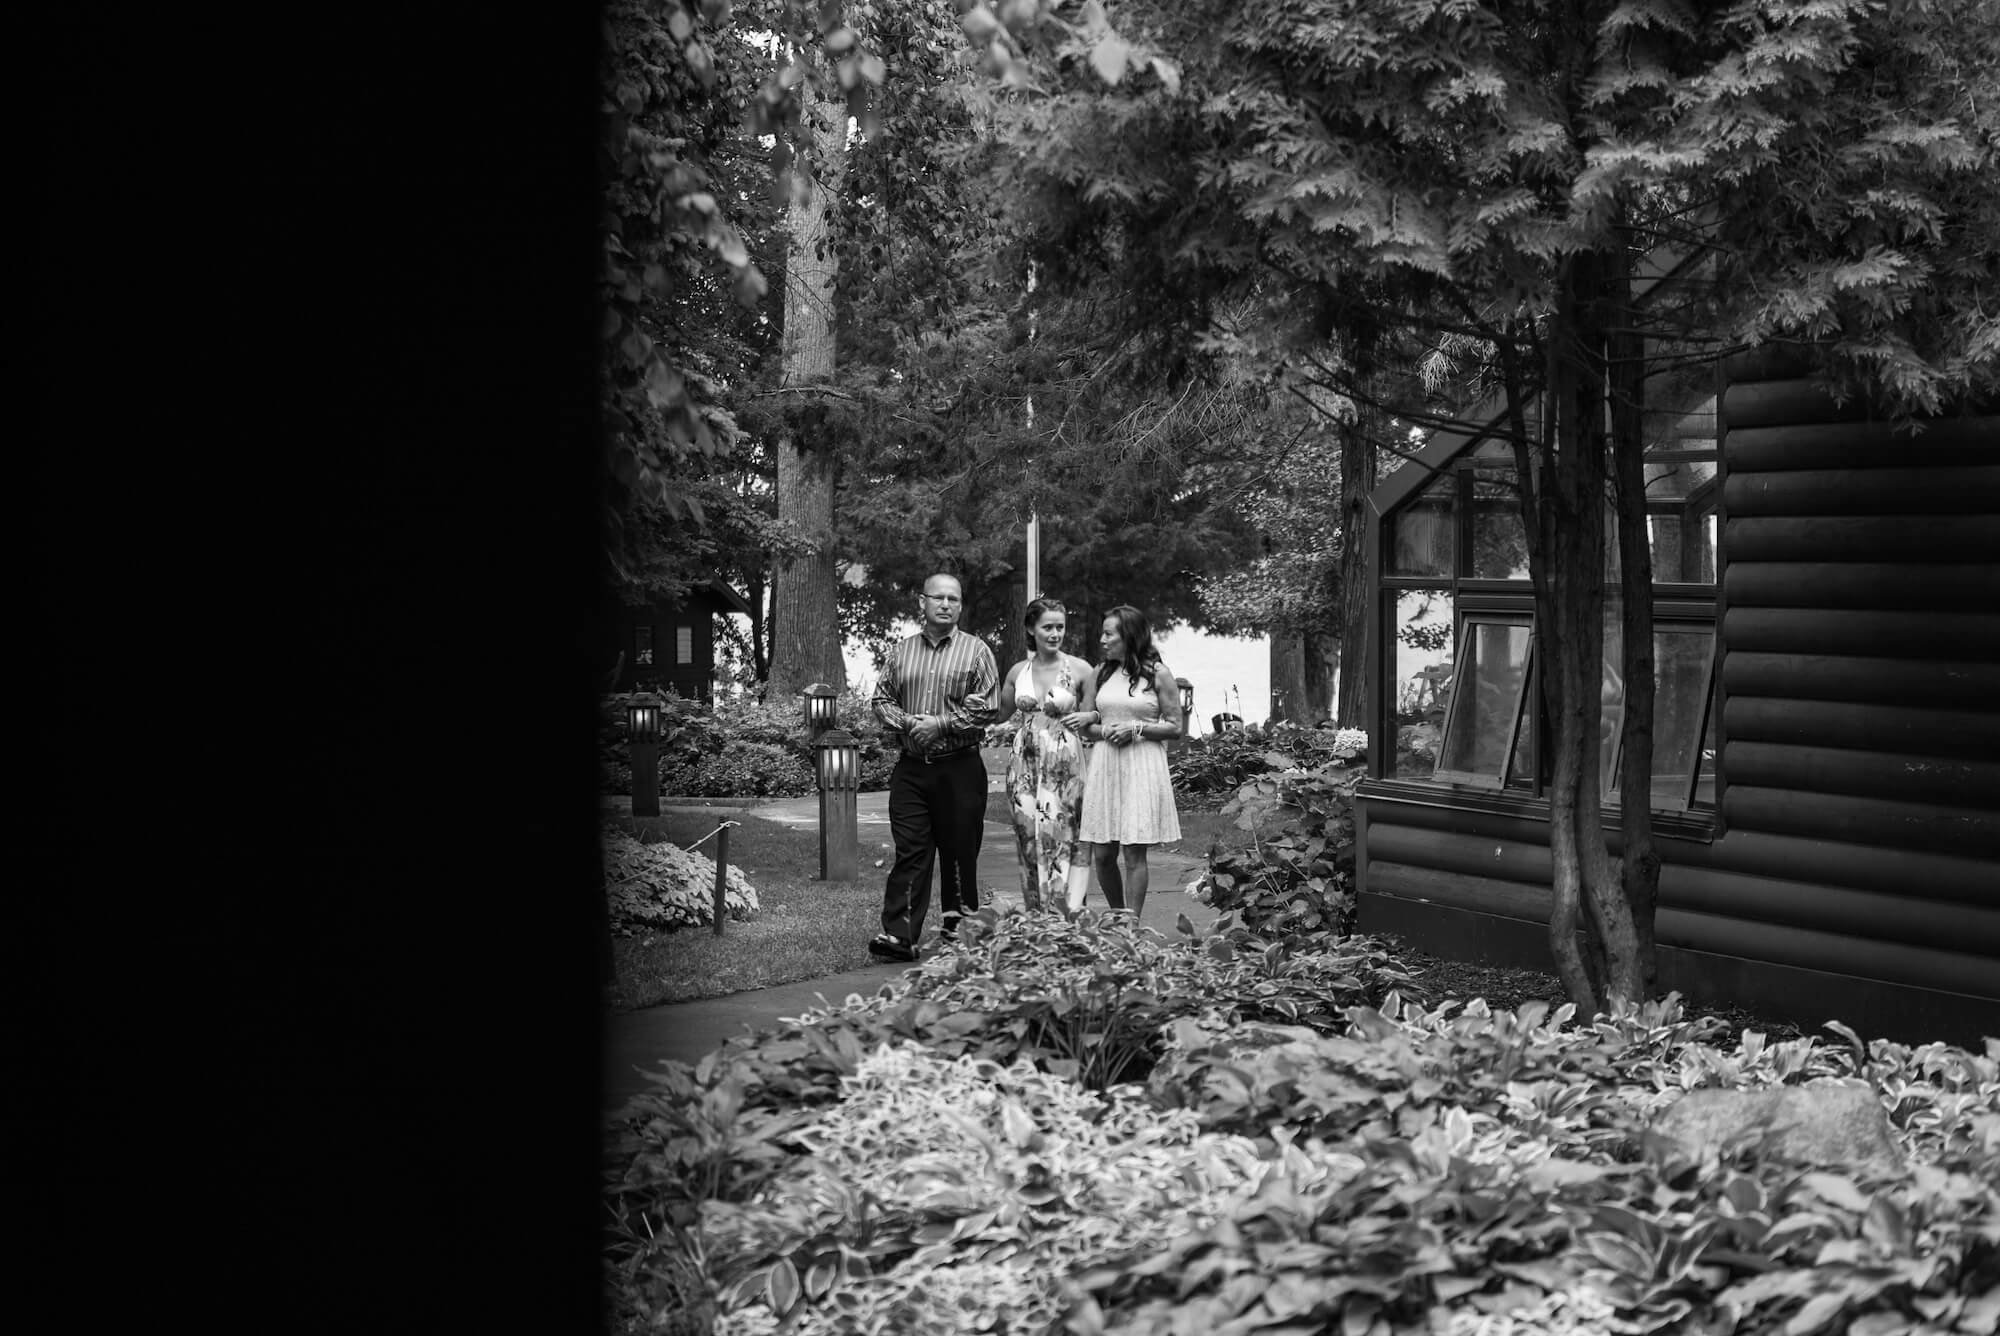 engle-olson-maddy-pat-mn-wedding-photography-15.jpg